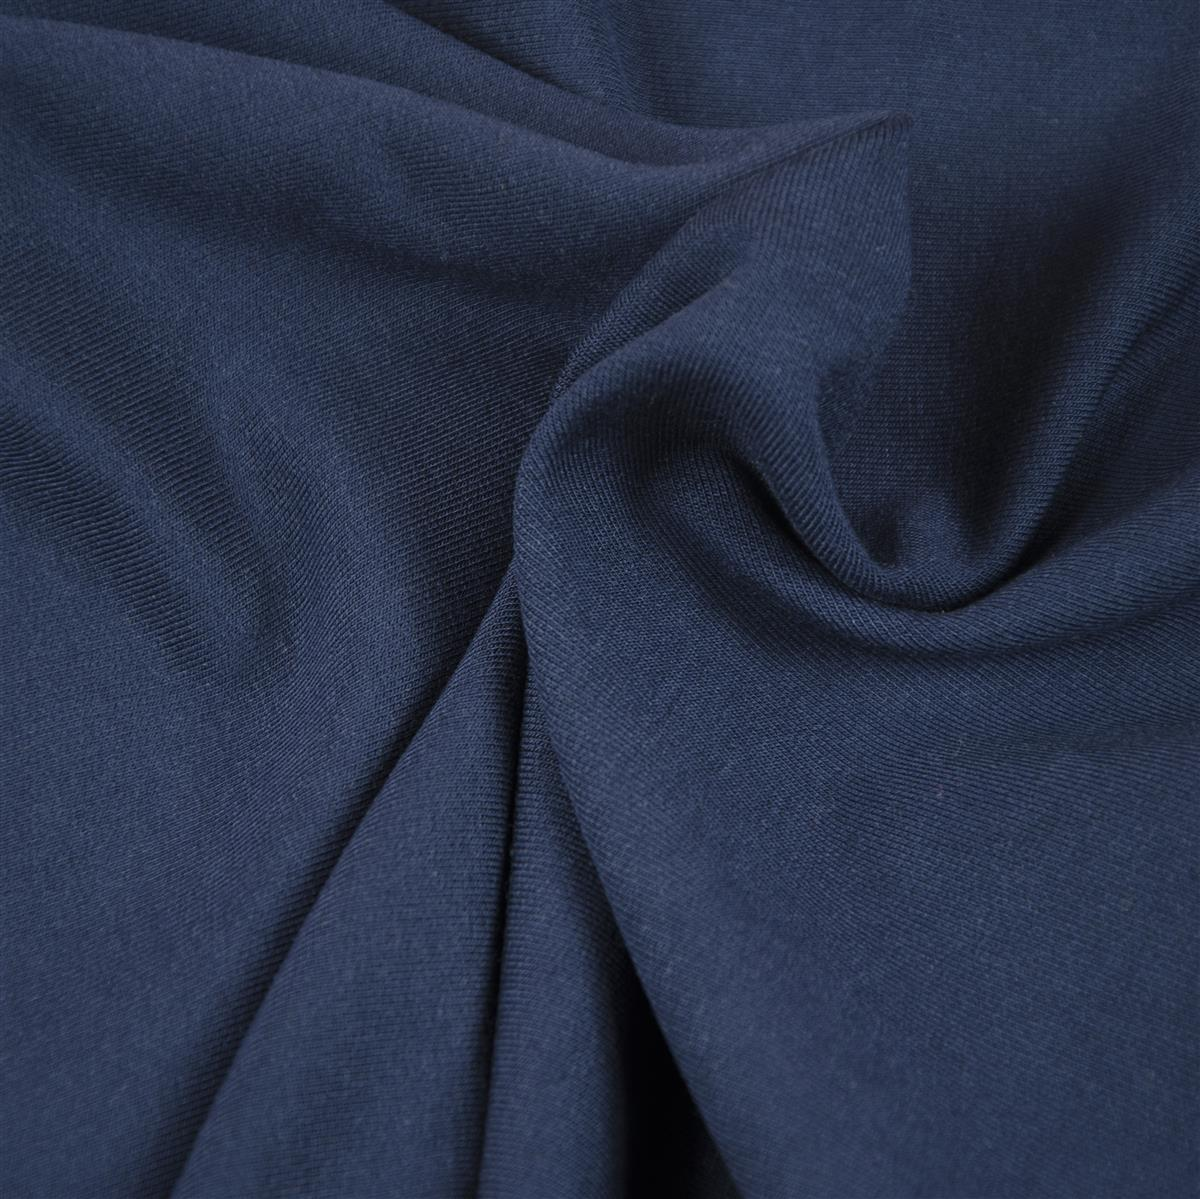 ModalSweat-dunkelblau